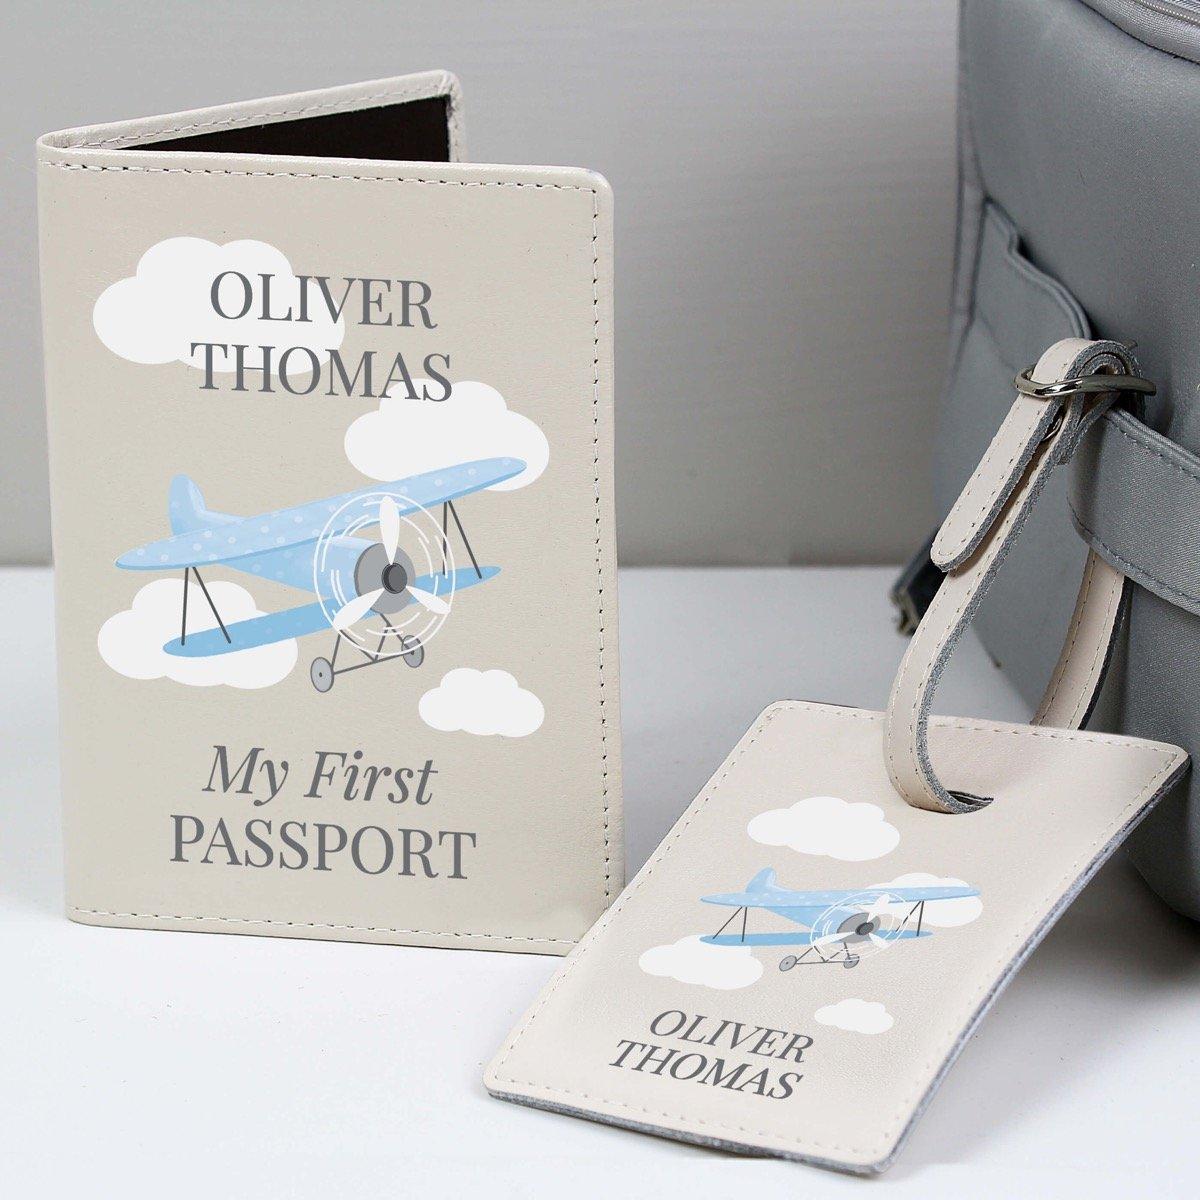 Personalised Blue Plane Passport Holder & Luggage Tag Set